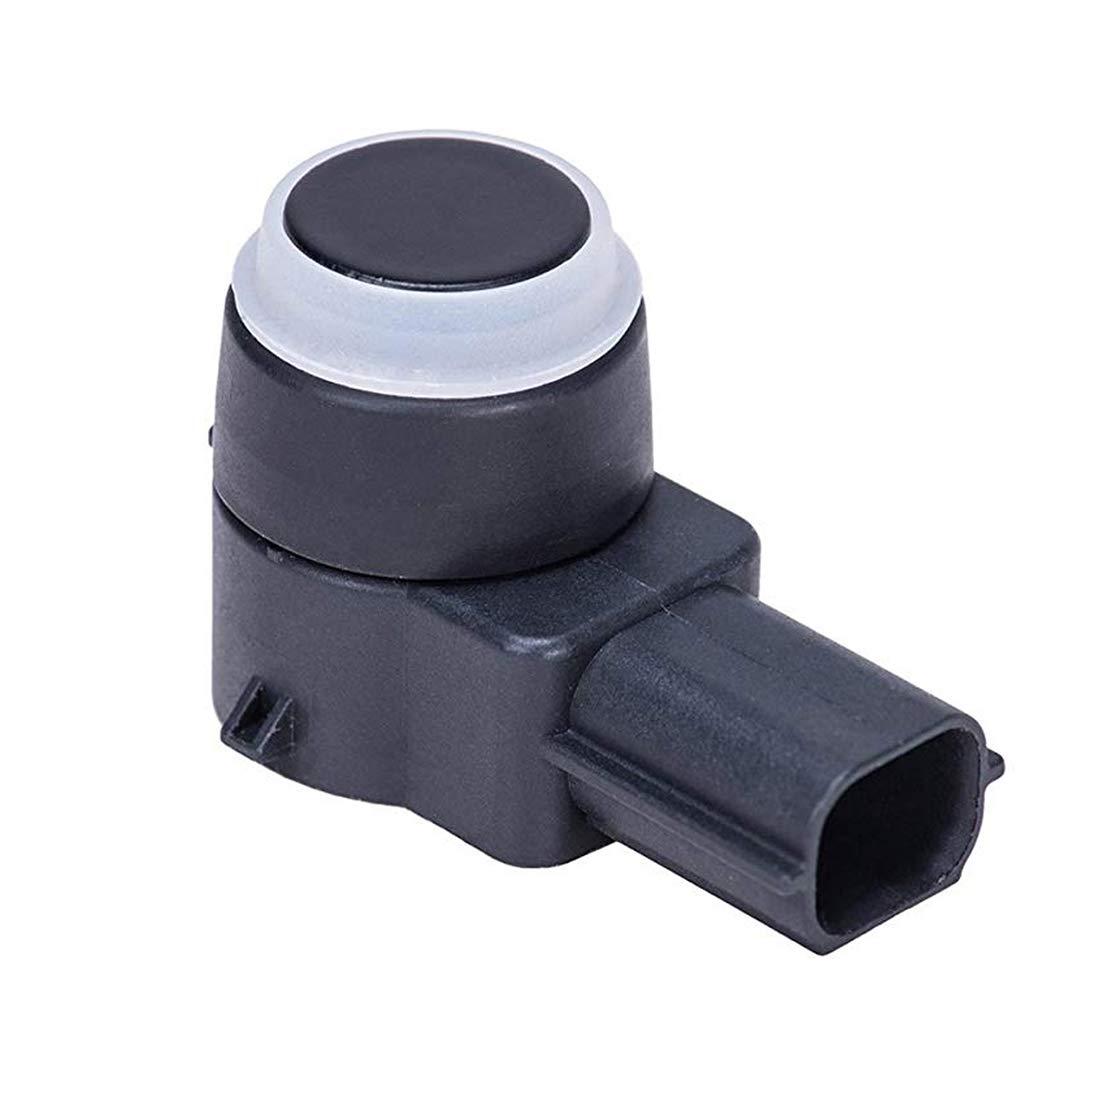 Autoly 3 Pin PDC Bumper Parking Sensor Park Assist Object Sensor w Rubber O-Ring for Buick Regal 2.4L 2011-2014 263003613 13242365